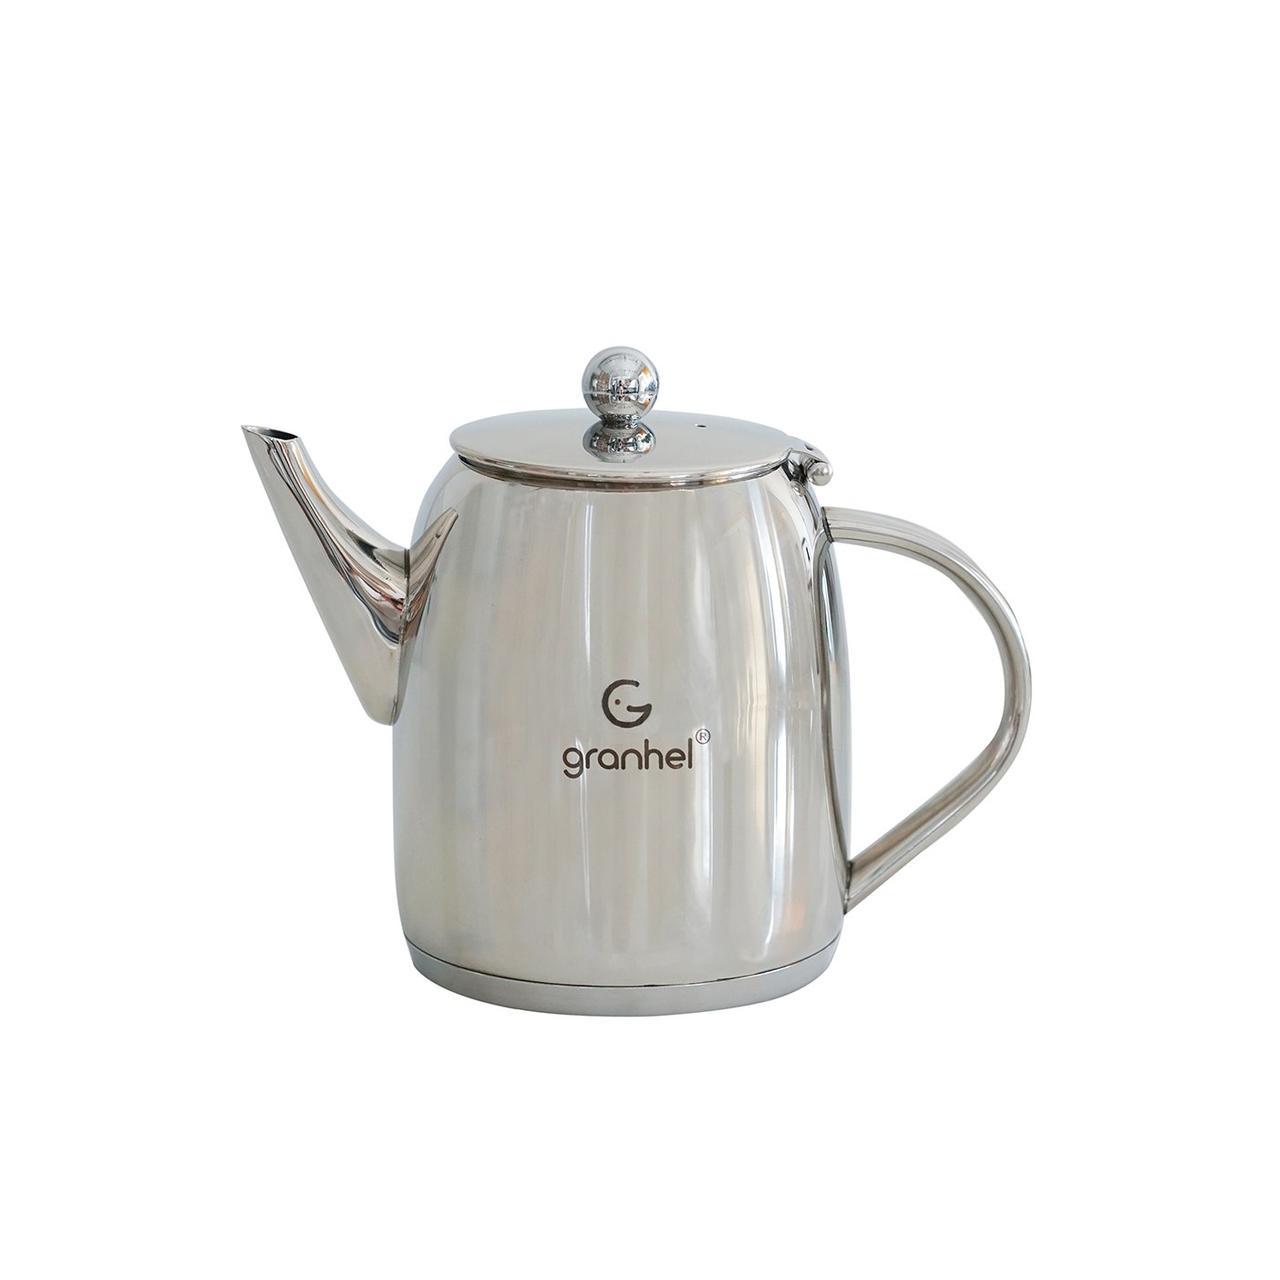 Чайник заварочный granhel Stainless steel 18/10 TS1.0 1,0 л